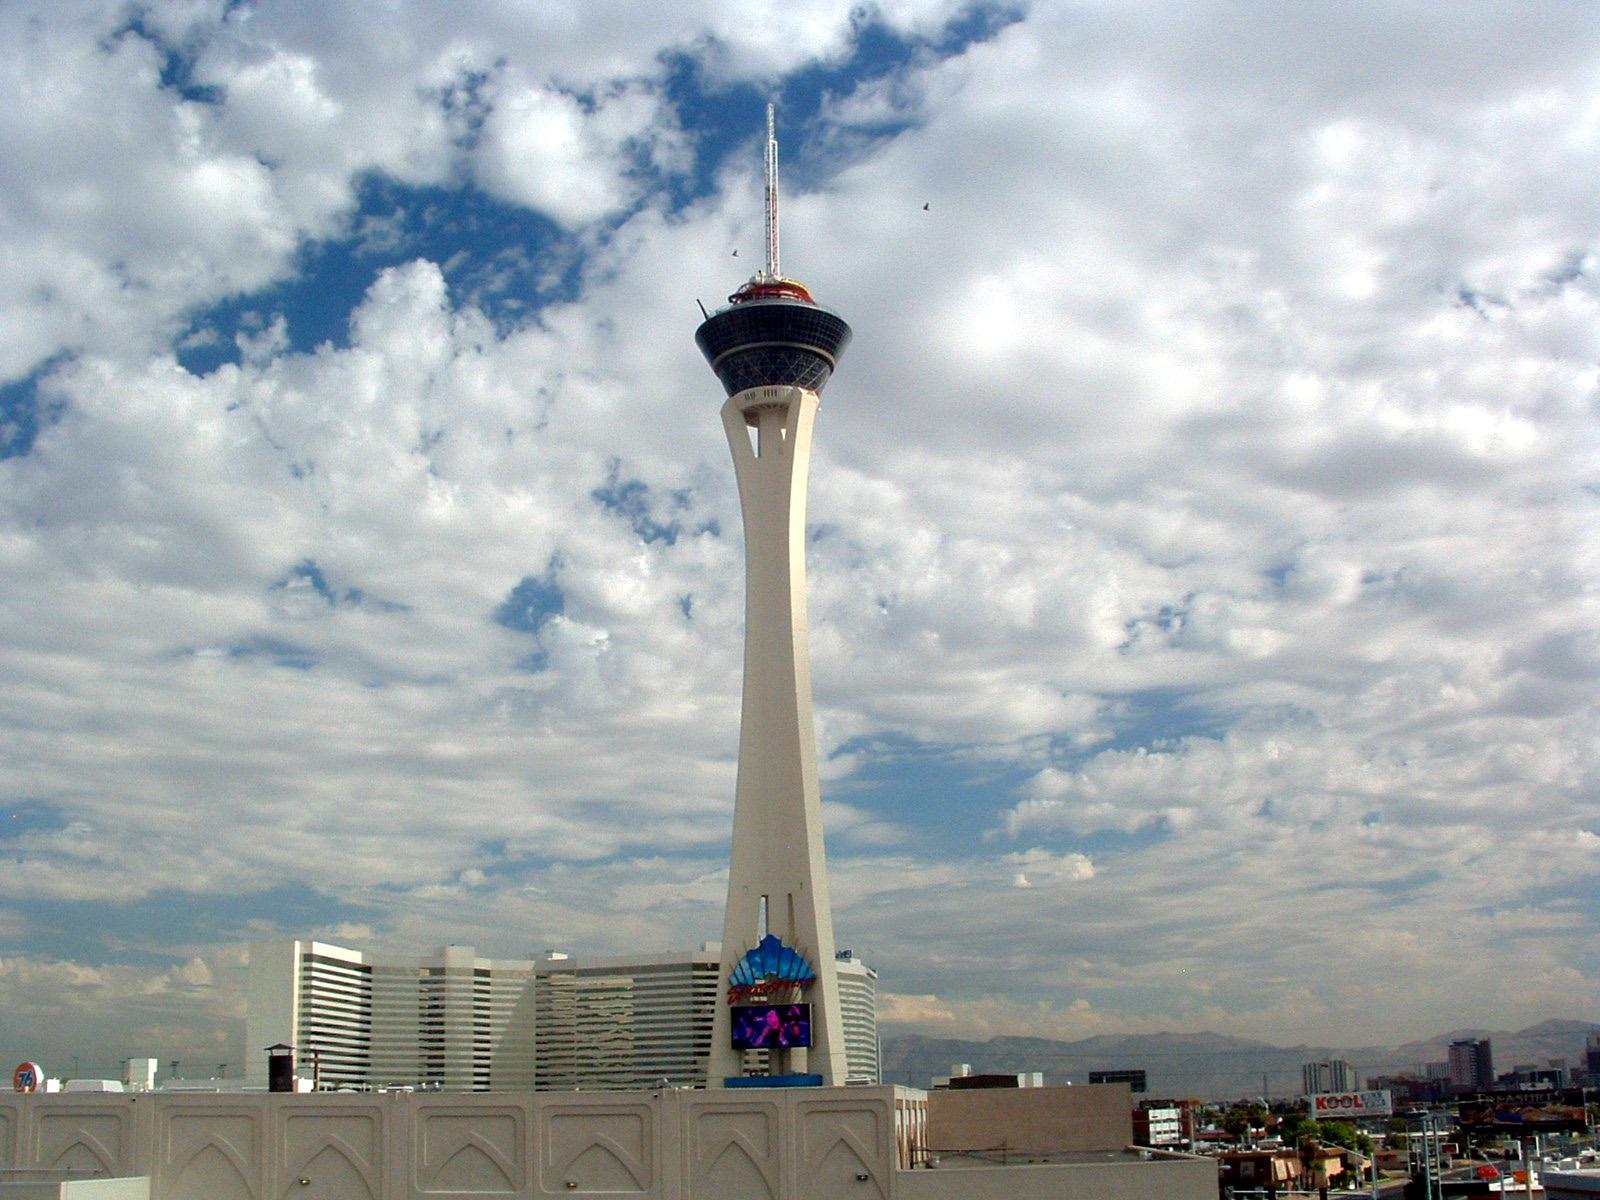 The_Vegas_Stratosphere